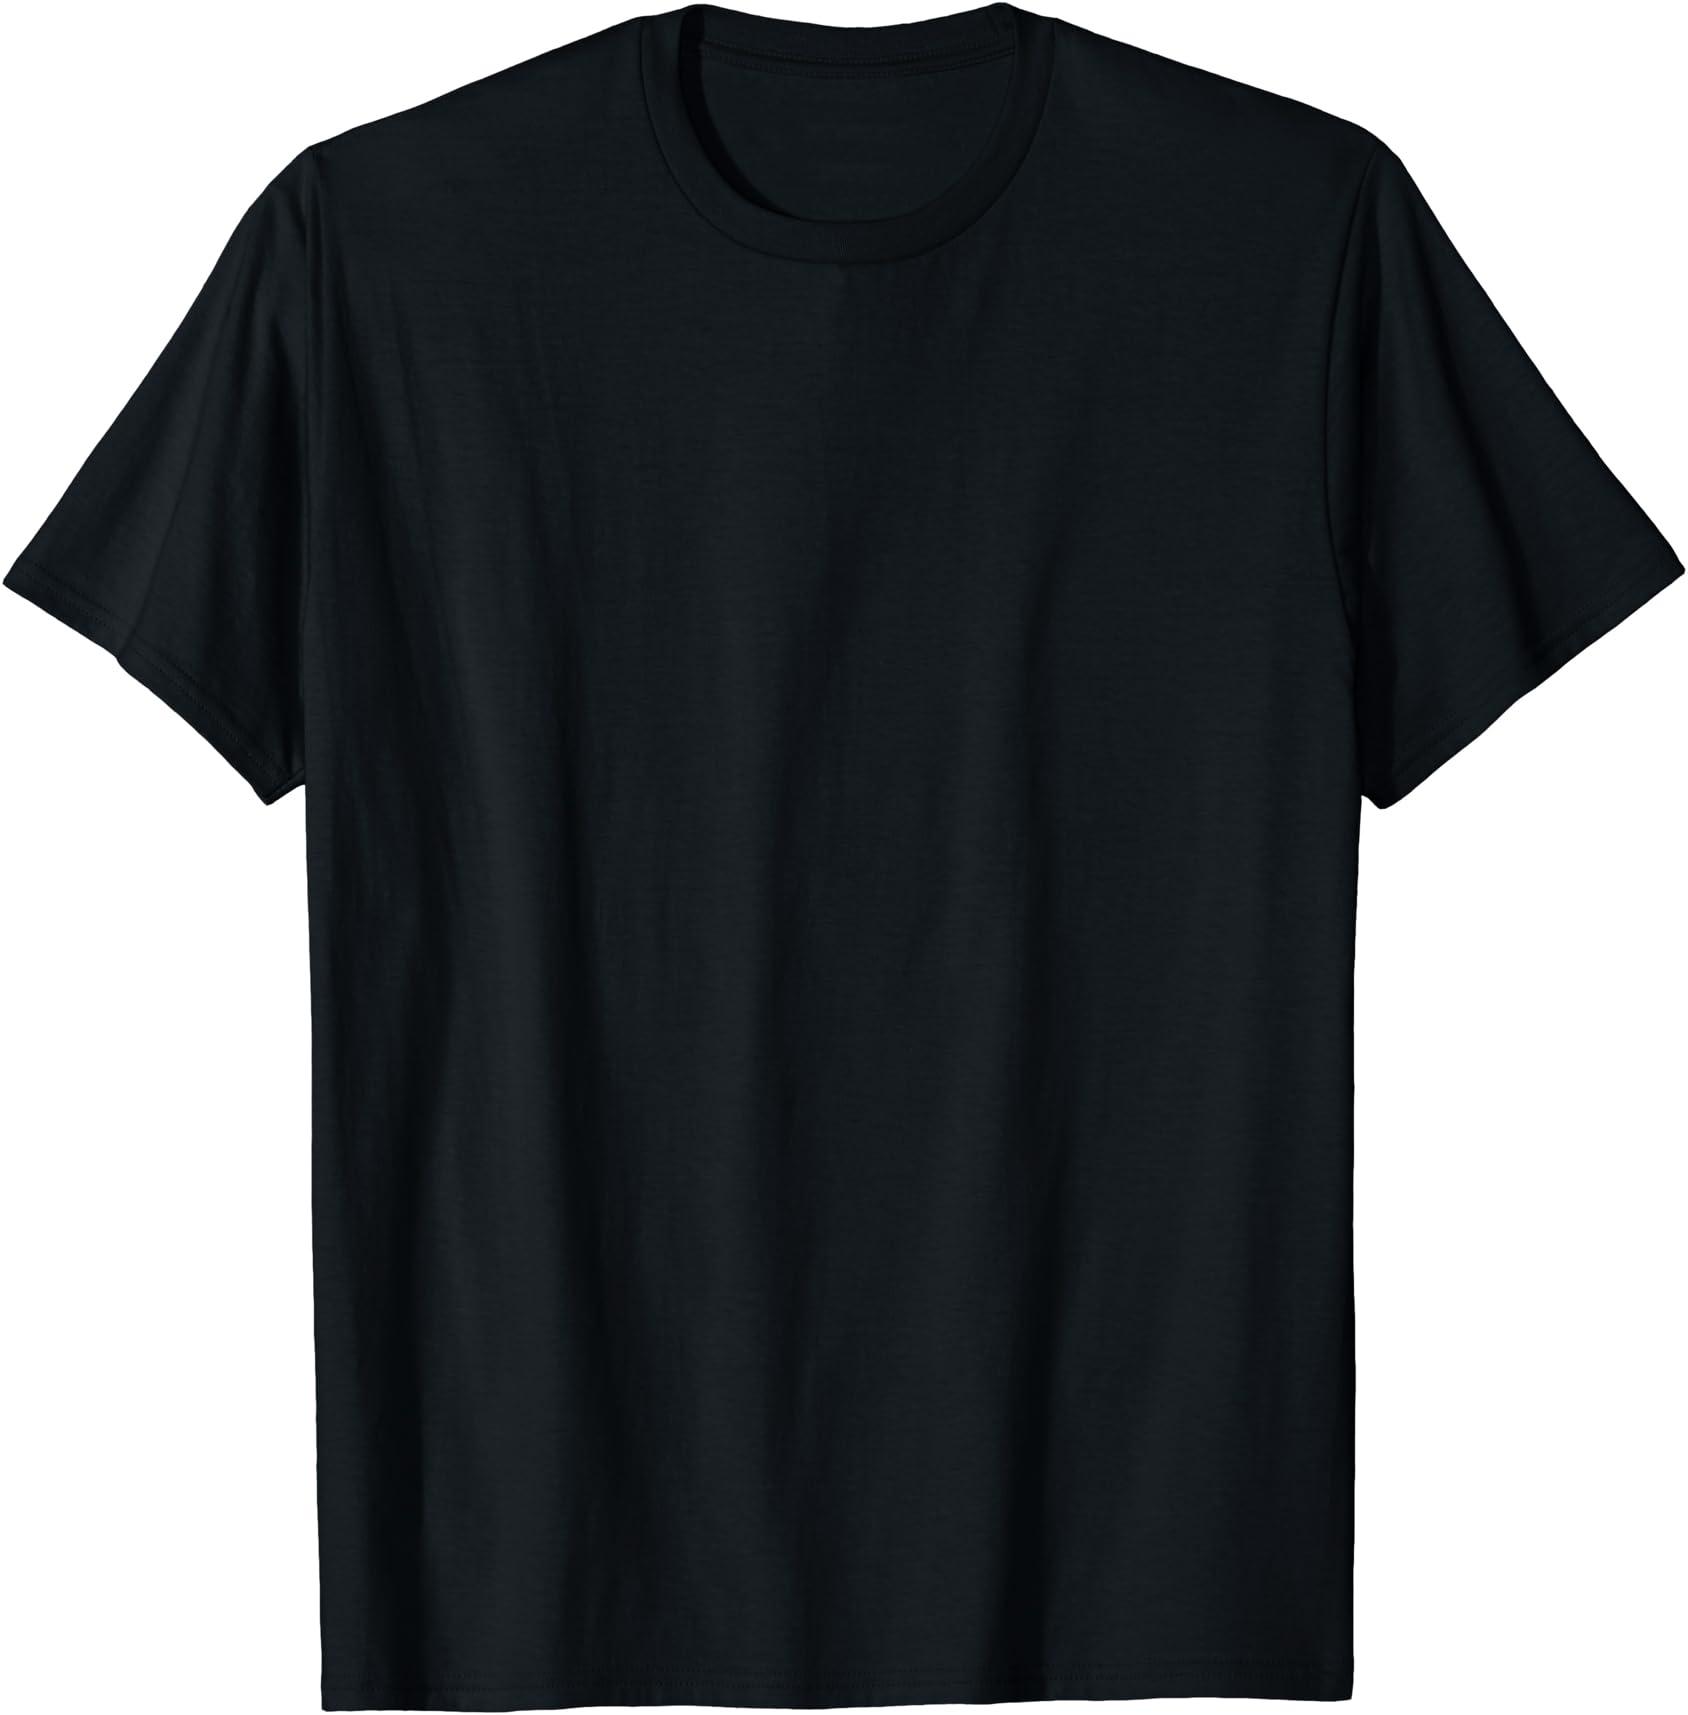 21st Birthday Gift T Shirt Cool Retro Girl Boys Teenage 21 Tee Shirts Present